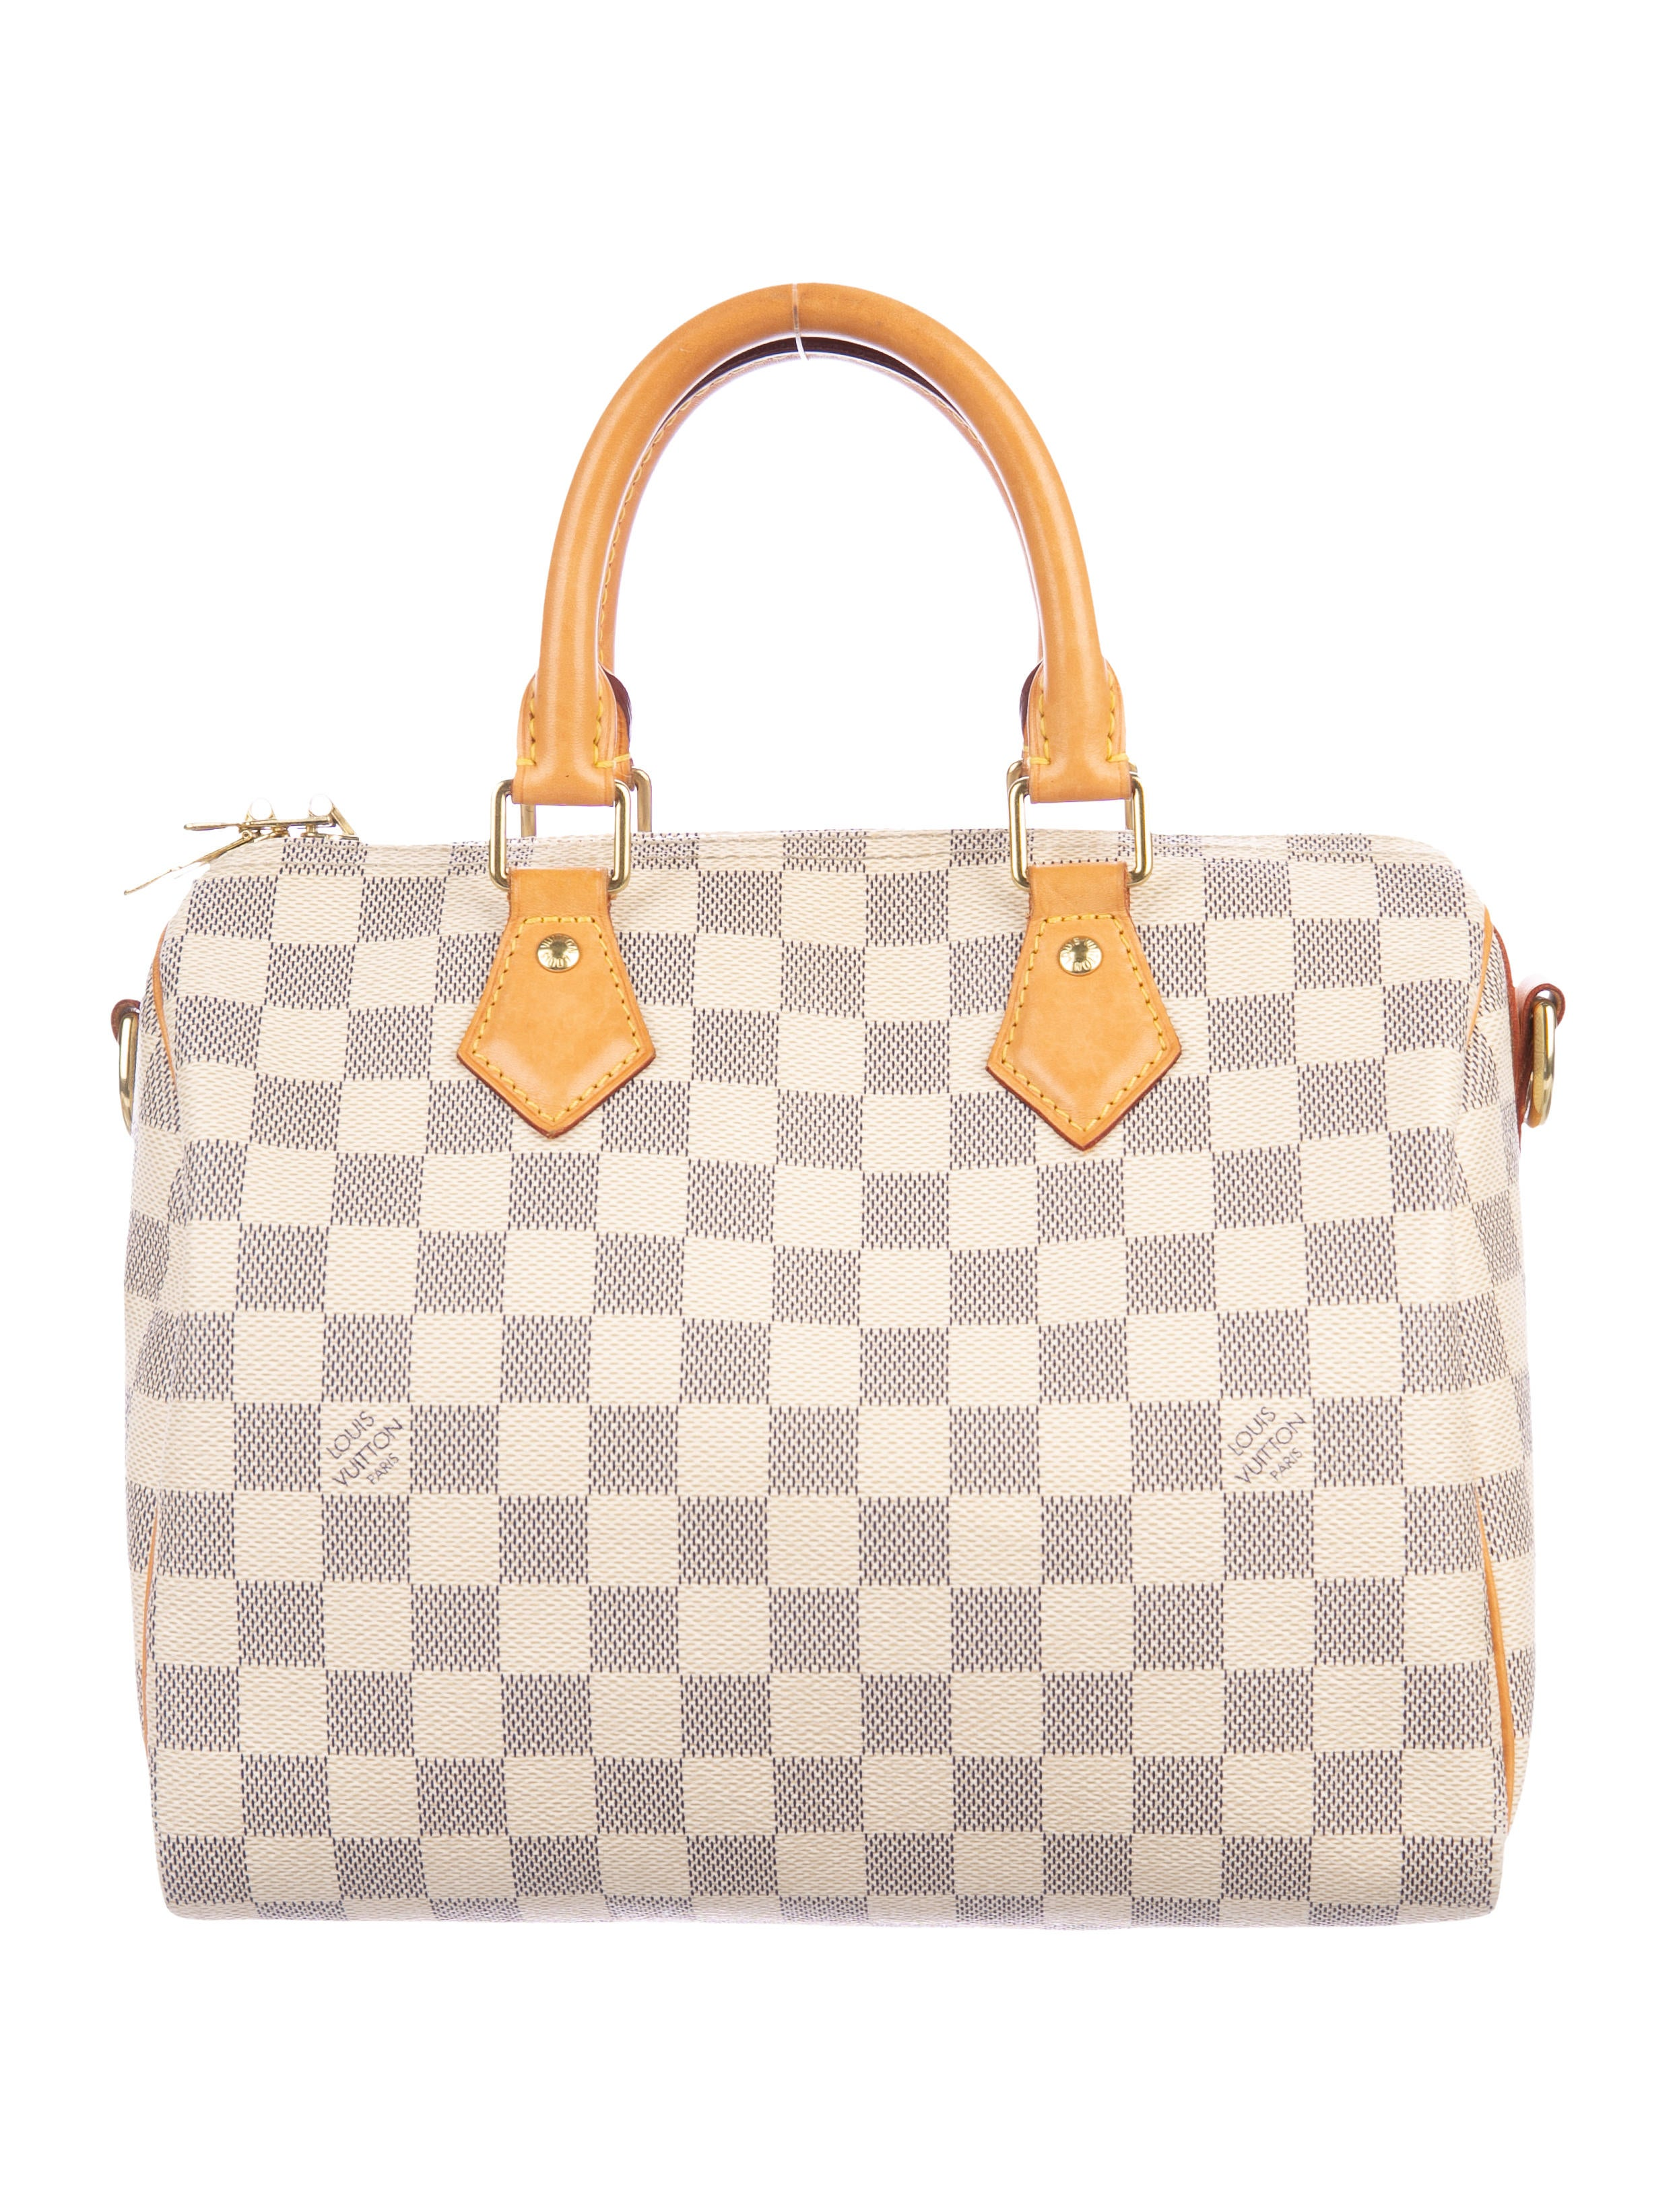 a97baa5e67fc Louis Vuitton Damier Azur Speedy Bandoulière 25 - Handbags ...